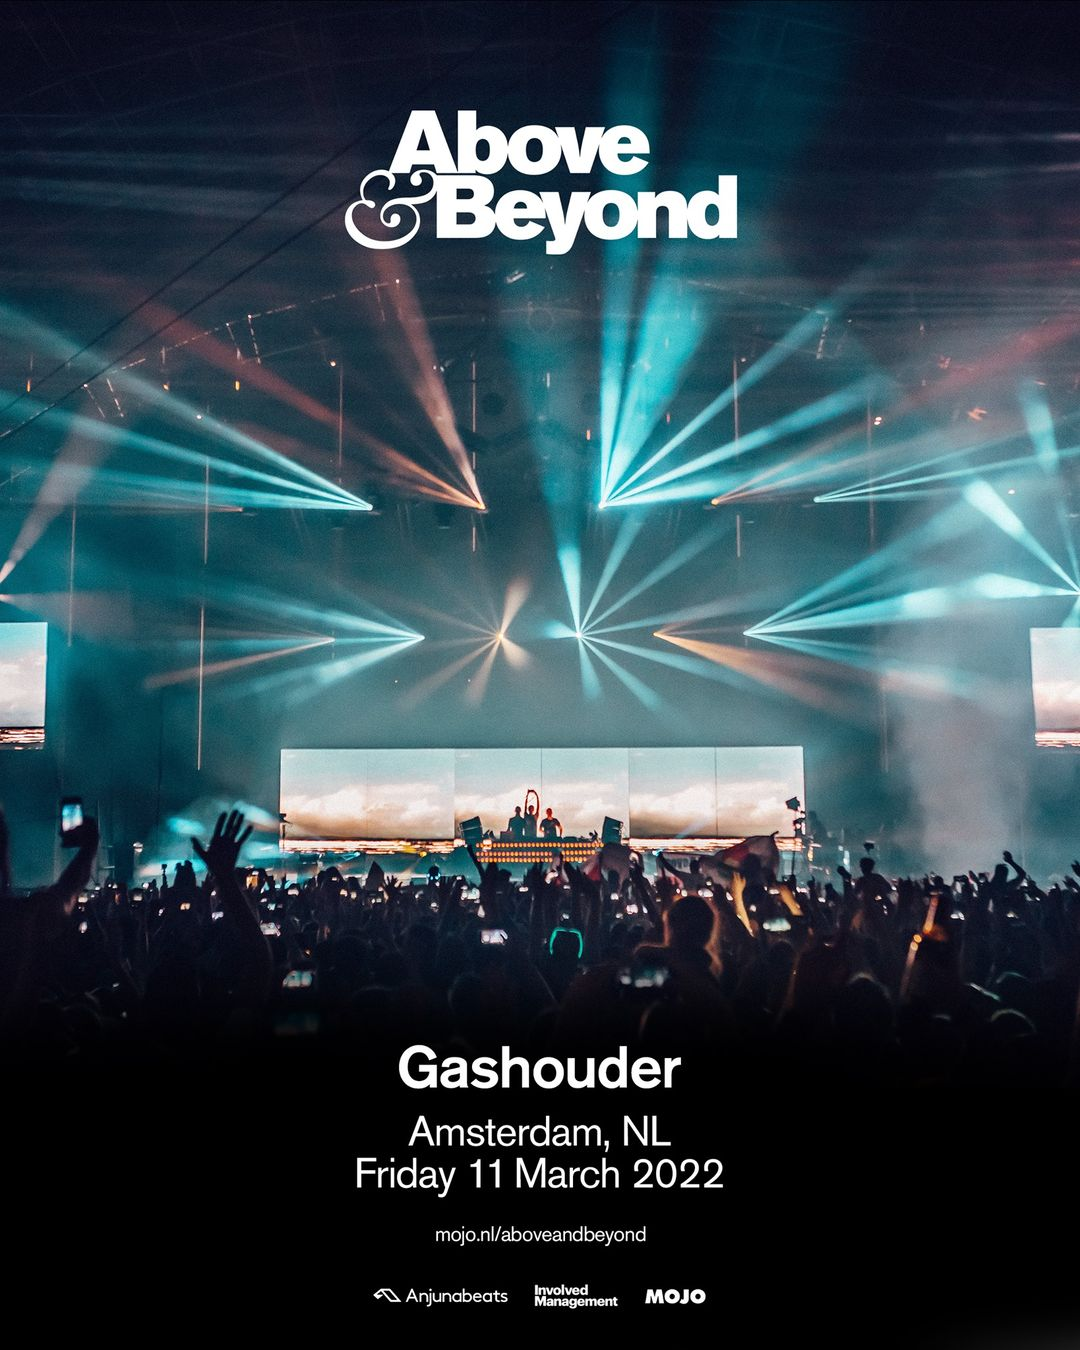 Above & Beyond Gashouder